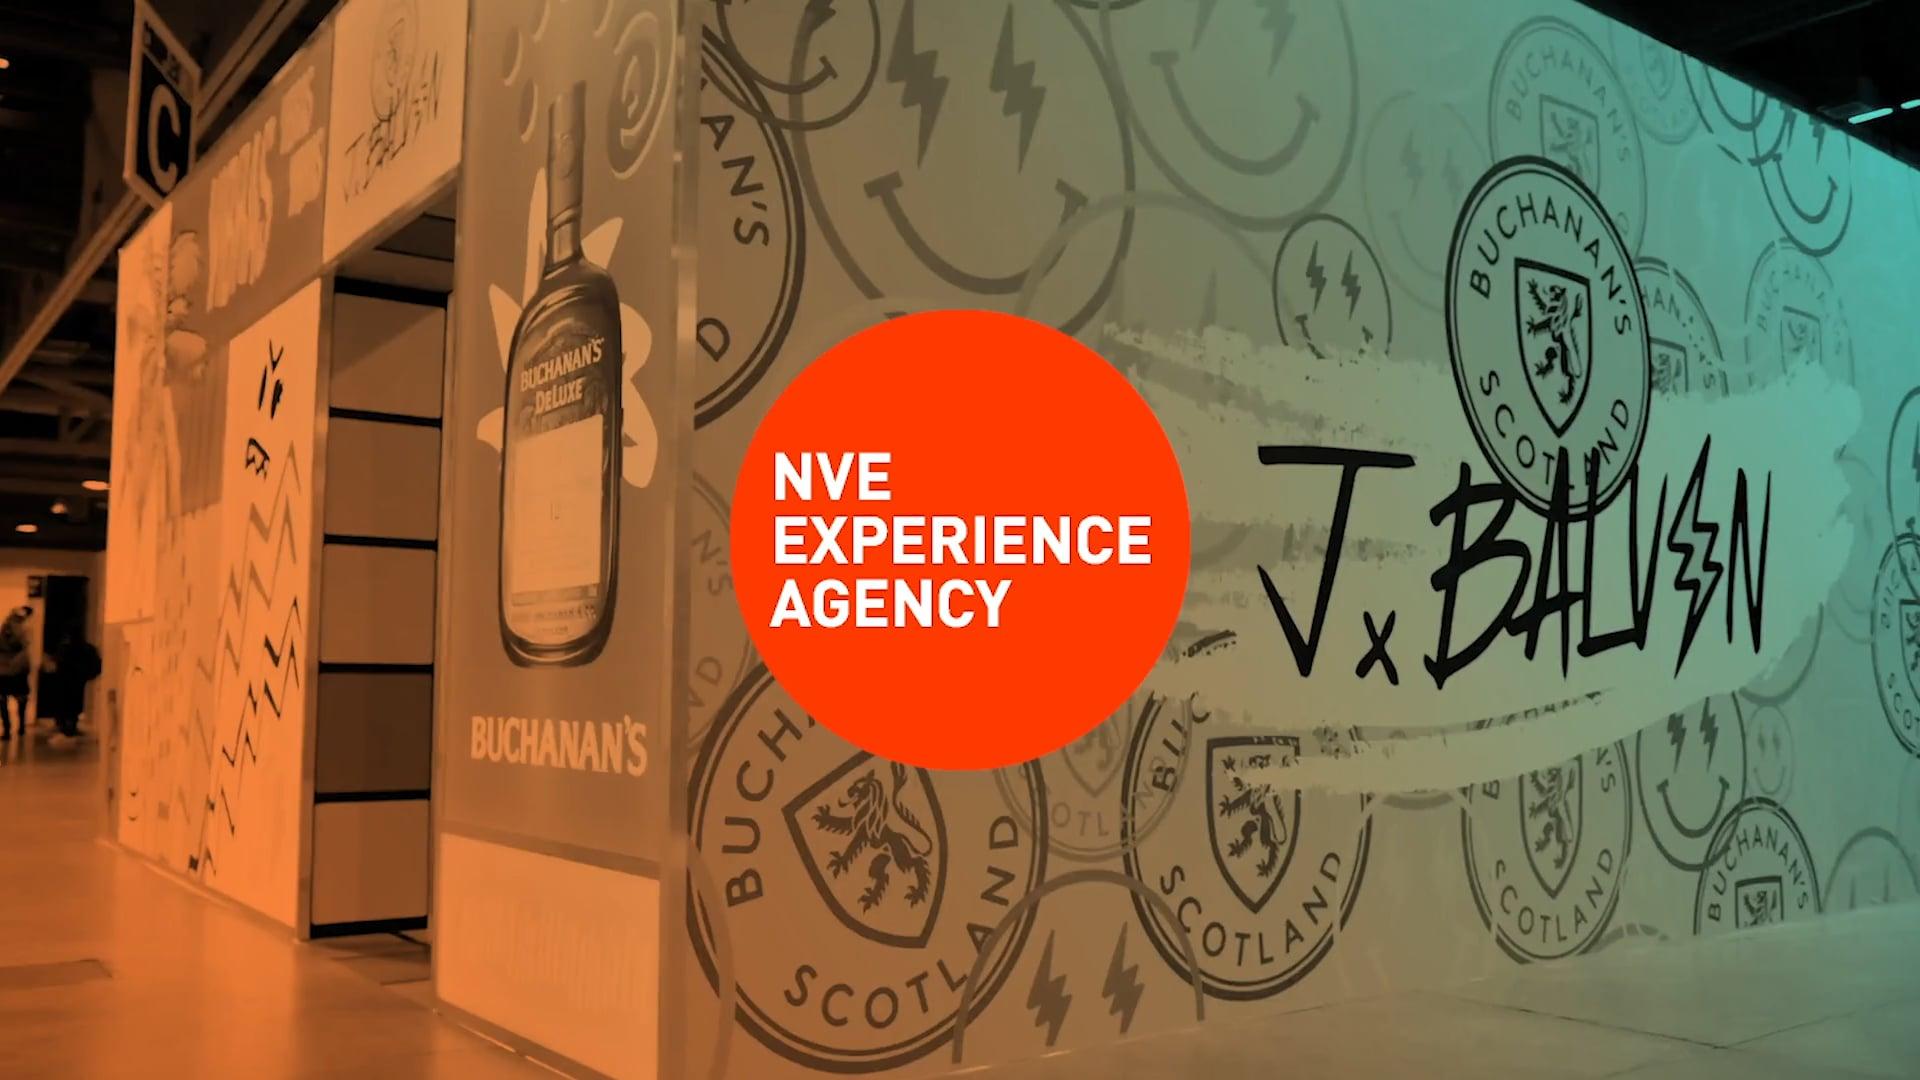 Agencia NVE Experience Agency | NVE 2019 Sizzle | USA